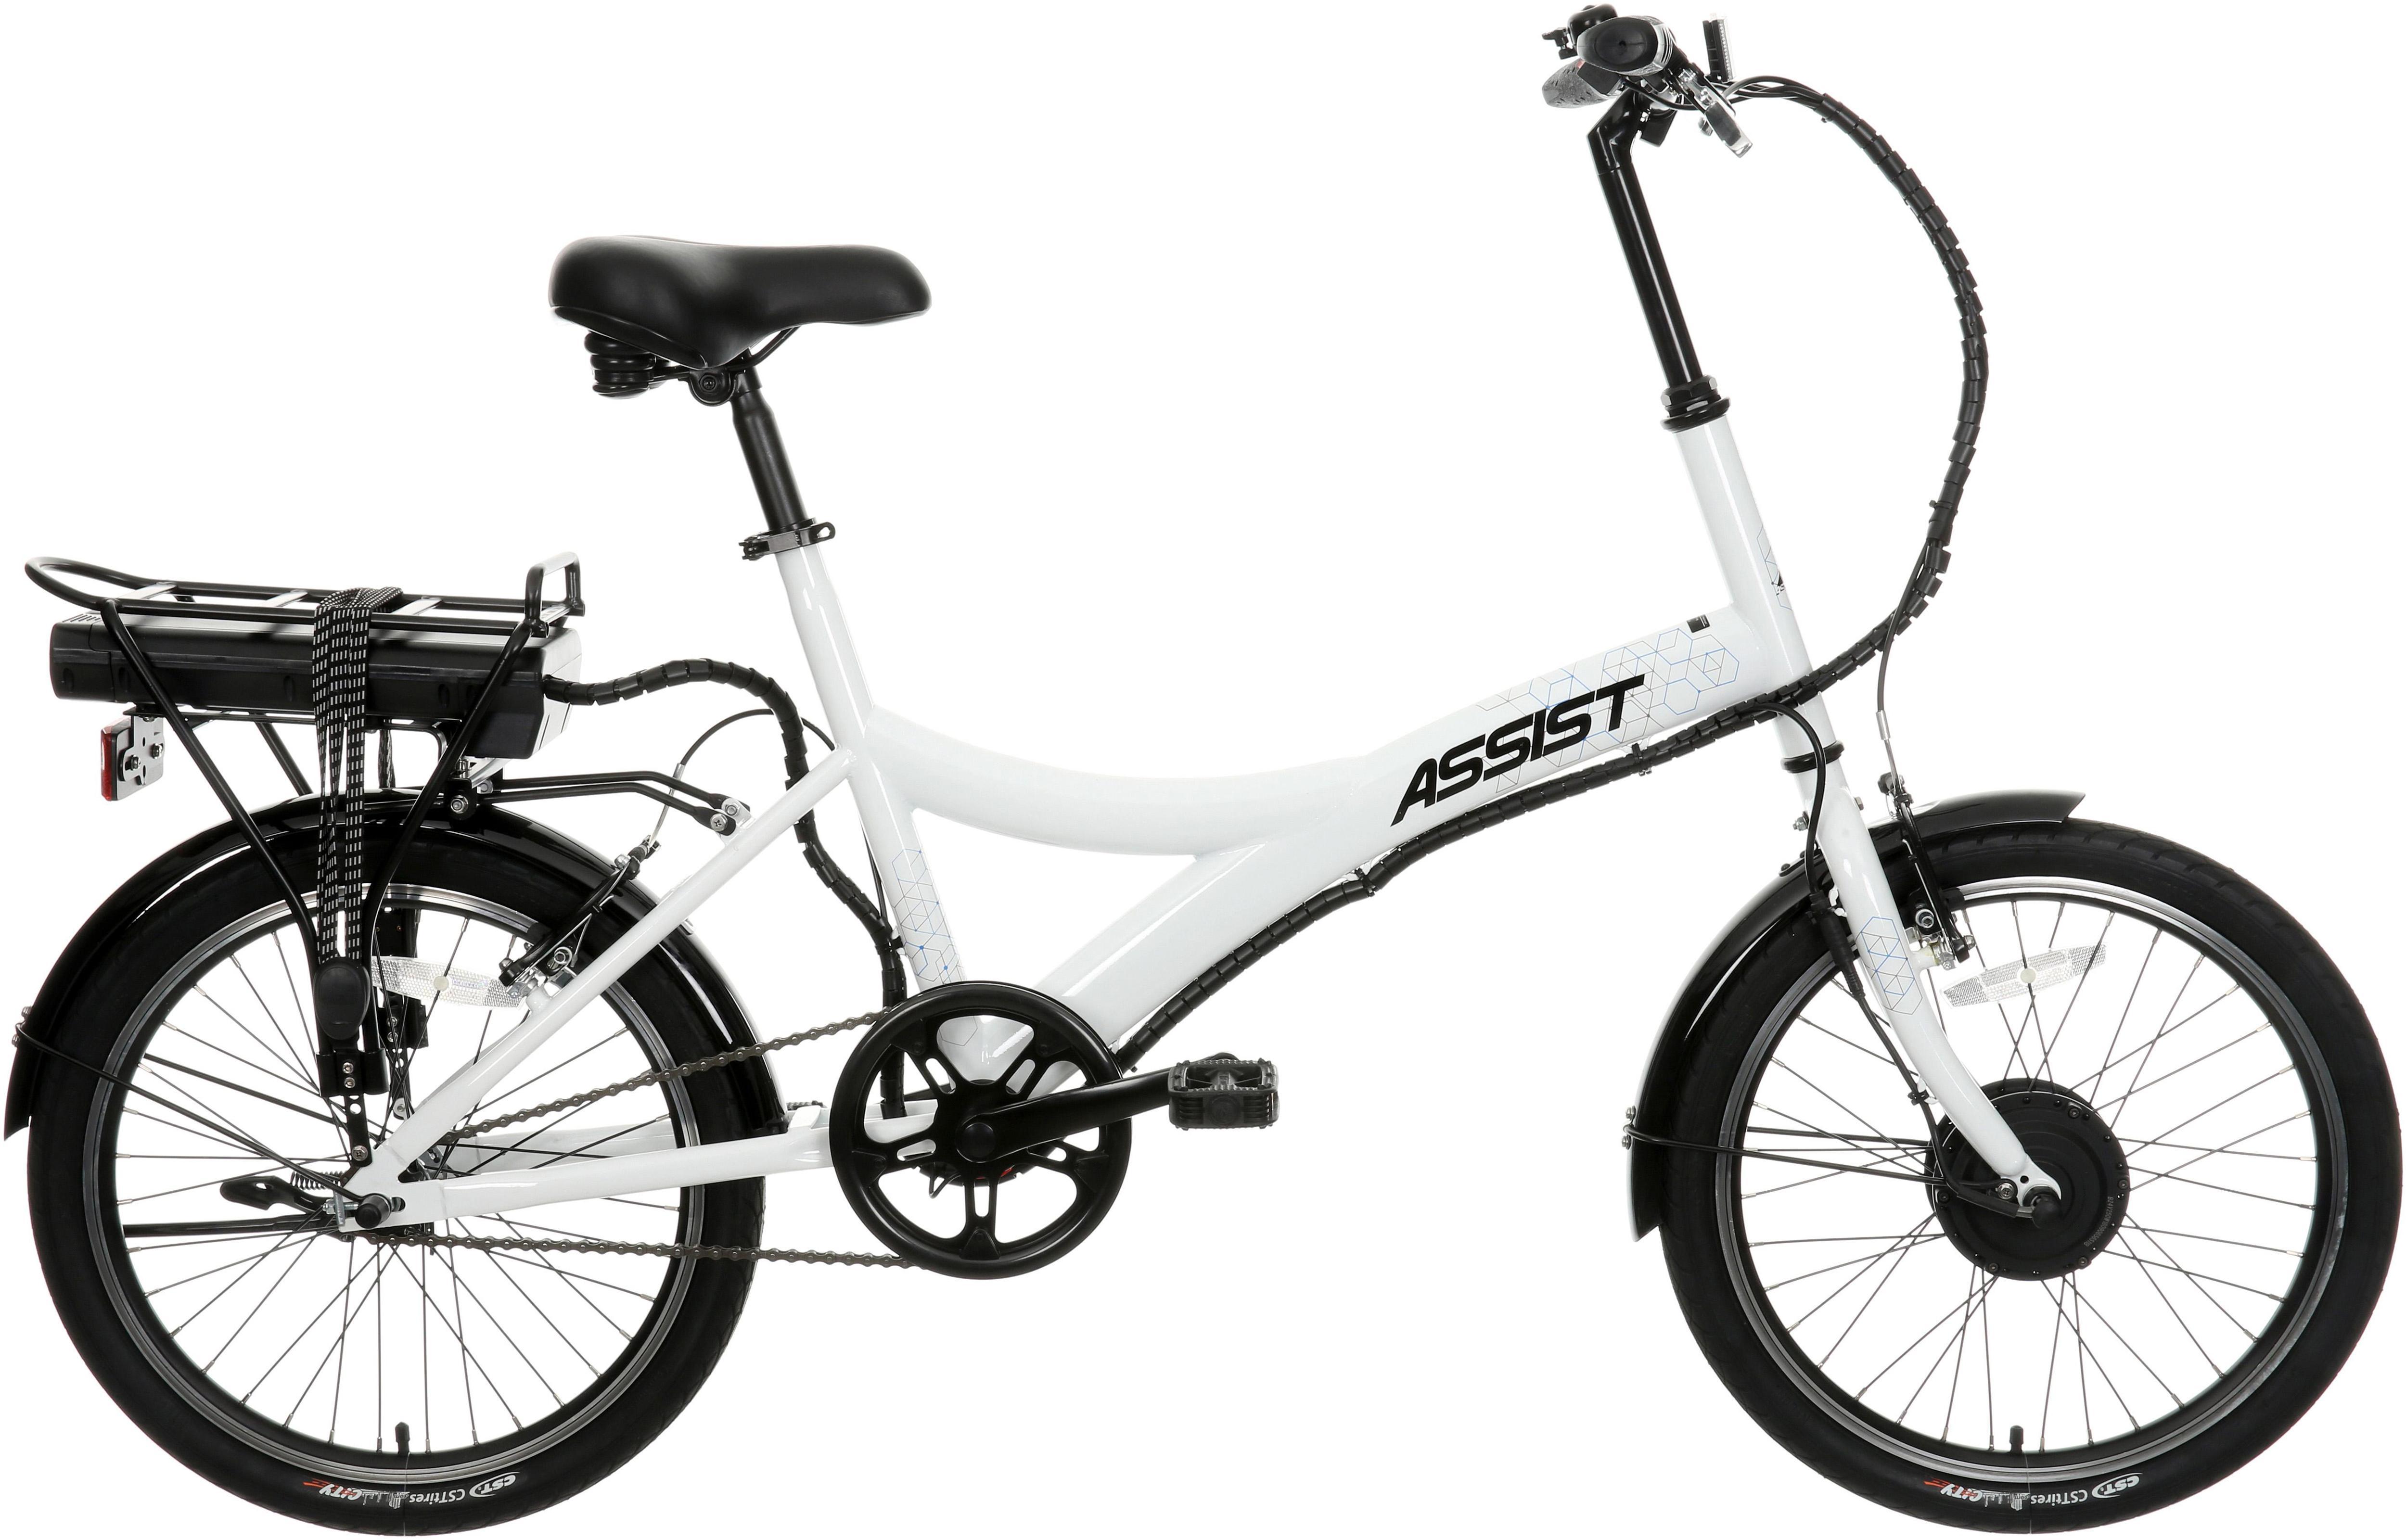 Assist Hybrid Electric Bike - 20 Inch Wheel